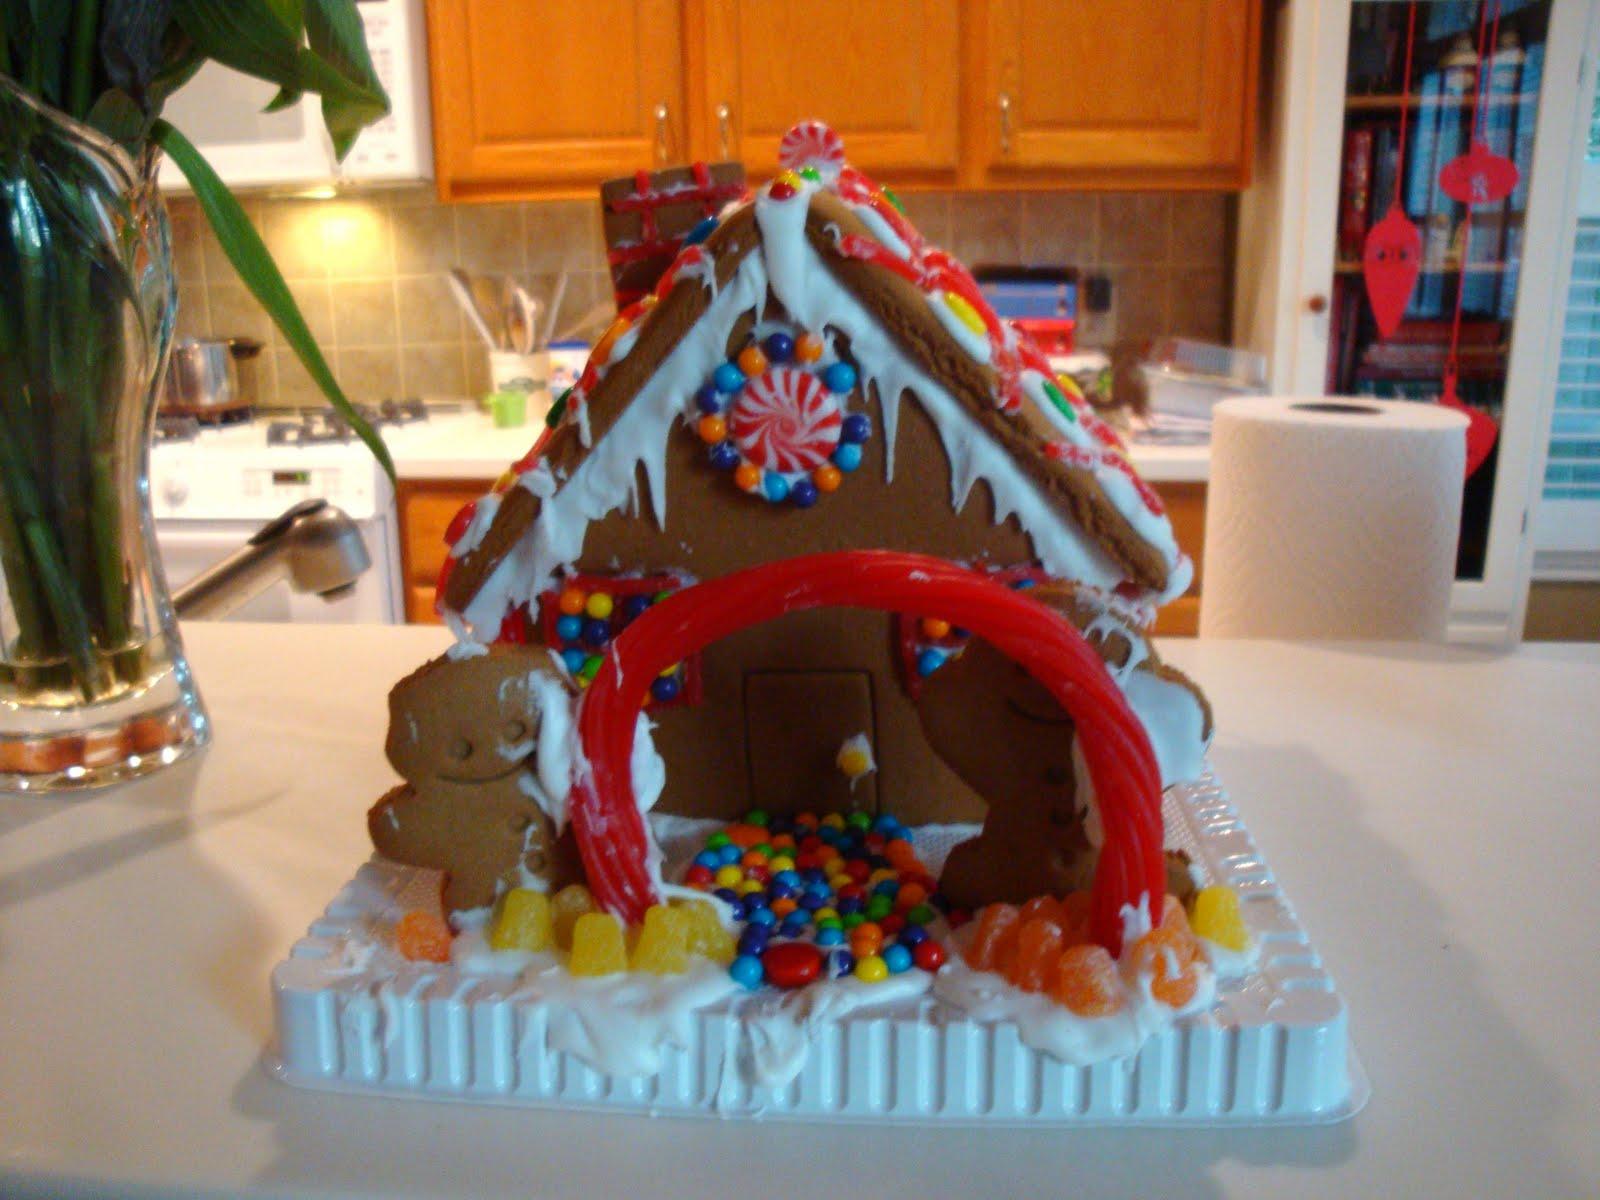 Penguinstamper The Official Gingerbread House Decorating